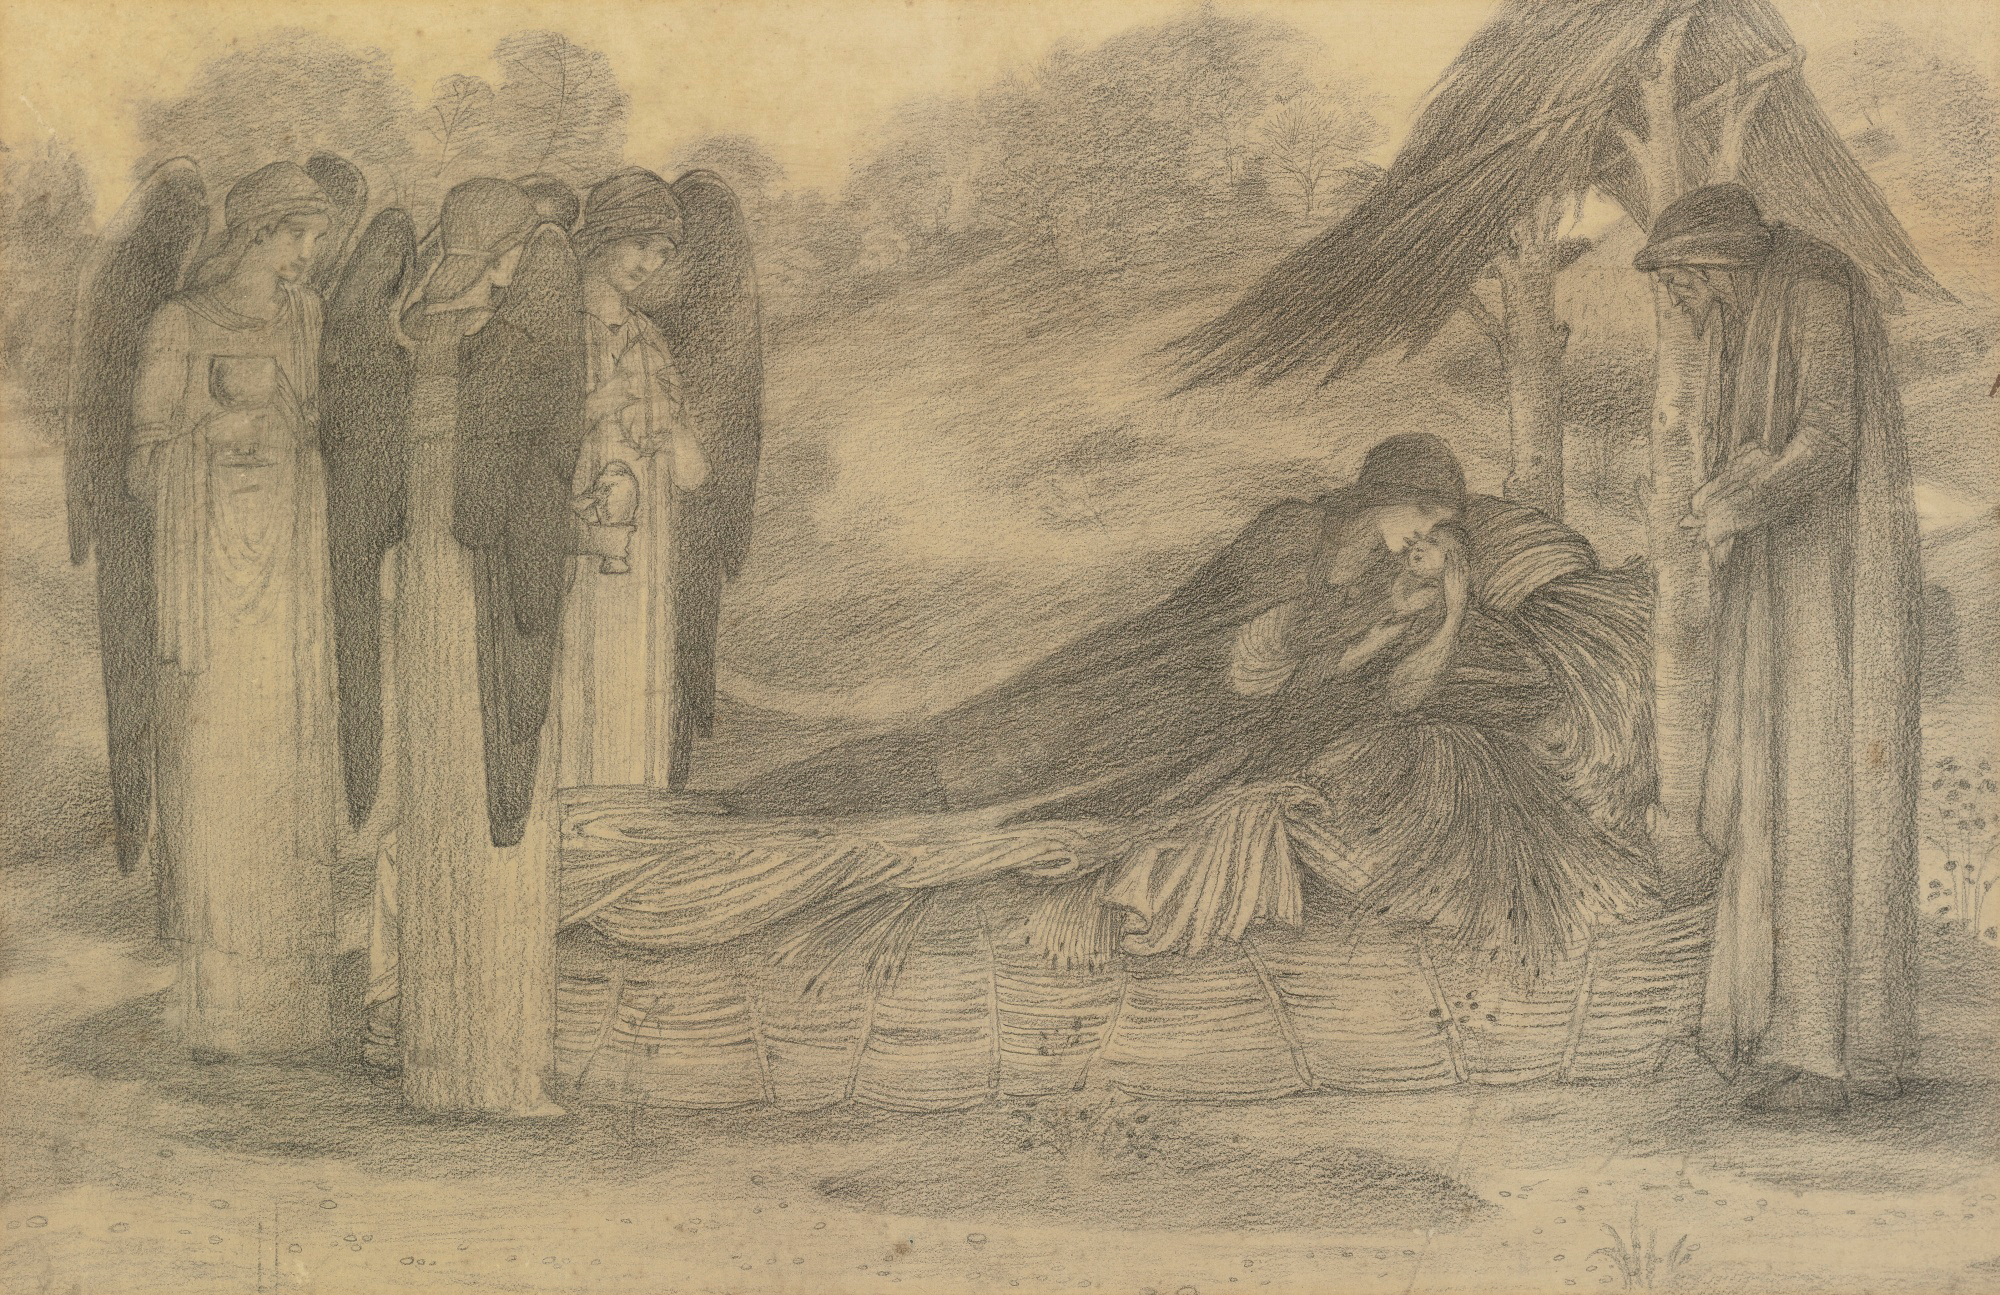 2000x1295 Filestudy For The Nativity, By Edward Burne Jones.jpg